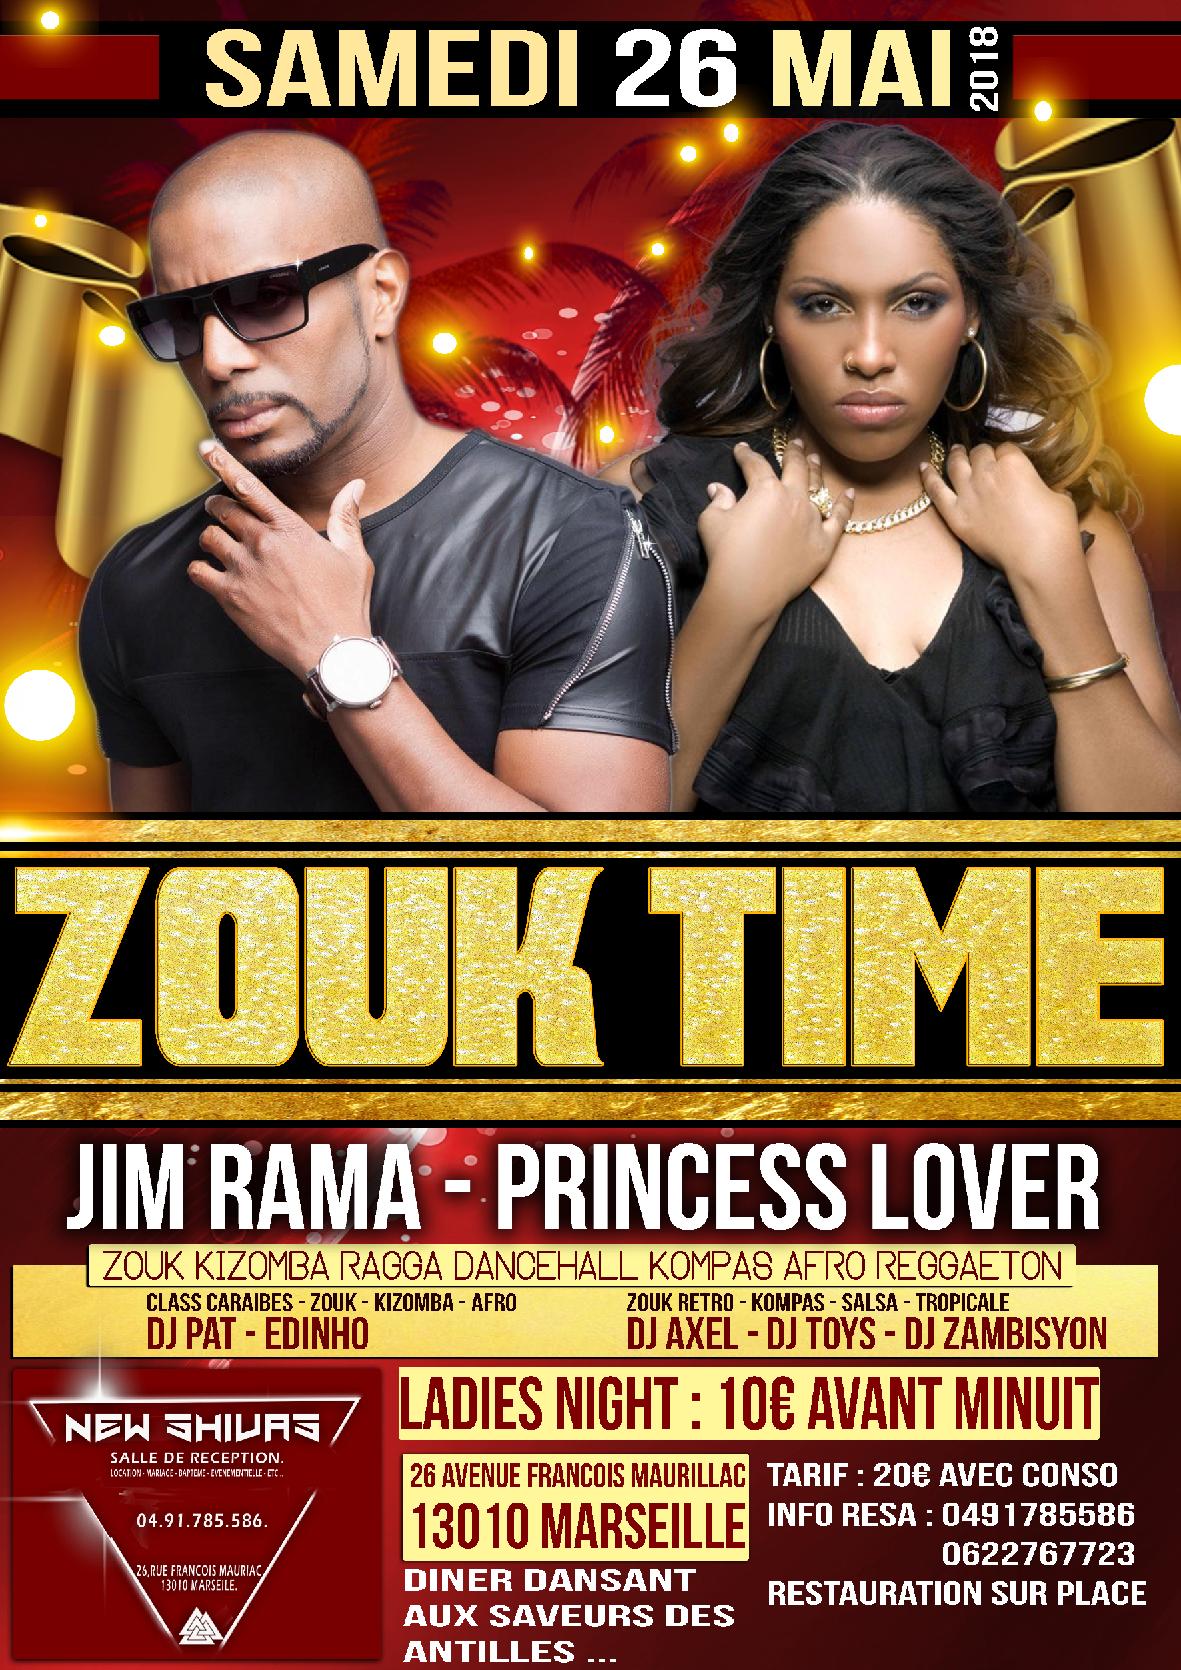 Showcase Zouk - PRINCESSE LOVER . JIM RAMA - LE SHIVAS MARSEILLE.